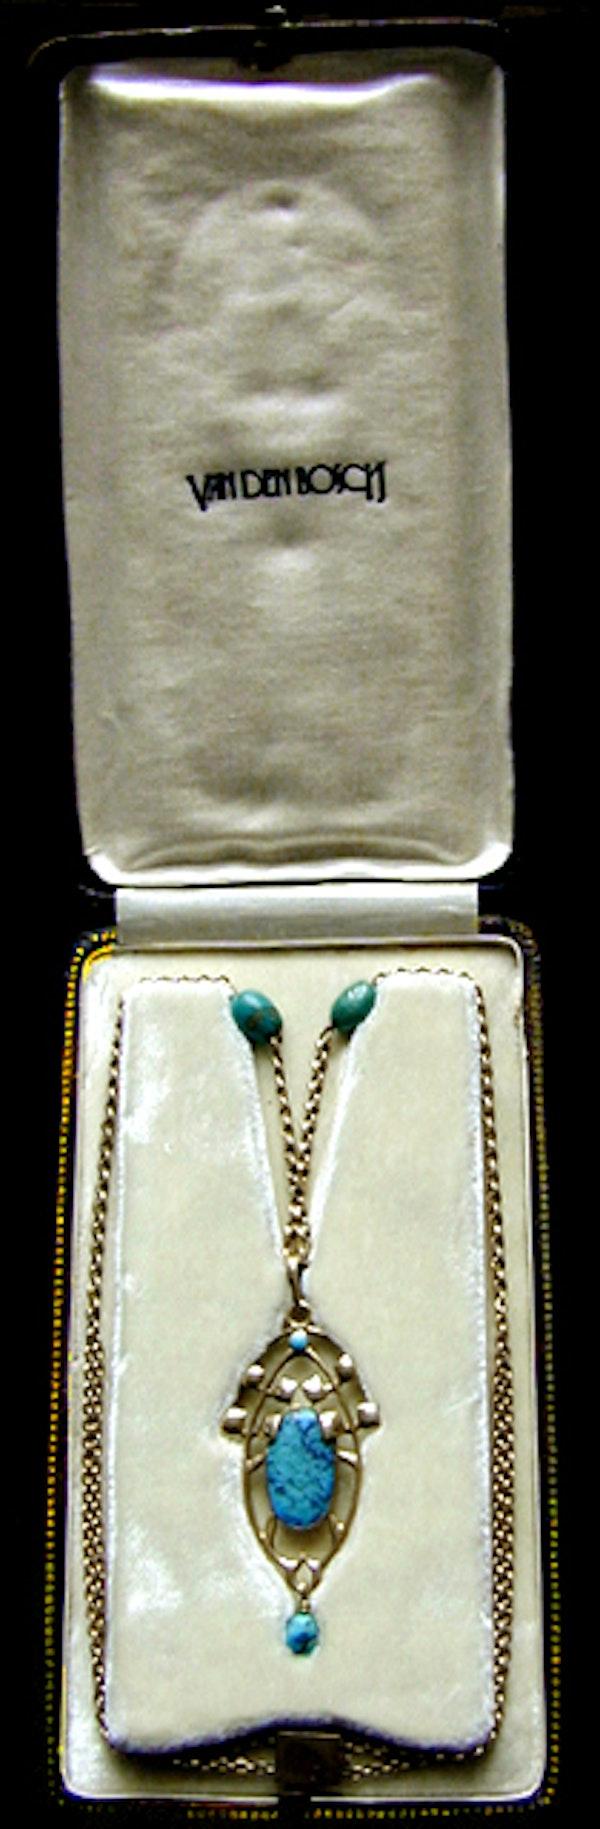 Archibald Knox for Liberty & Co. An Arts & Crafts / Art Nouveau Gold turquoise pendant. Circa 1900. - image 4